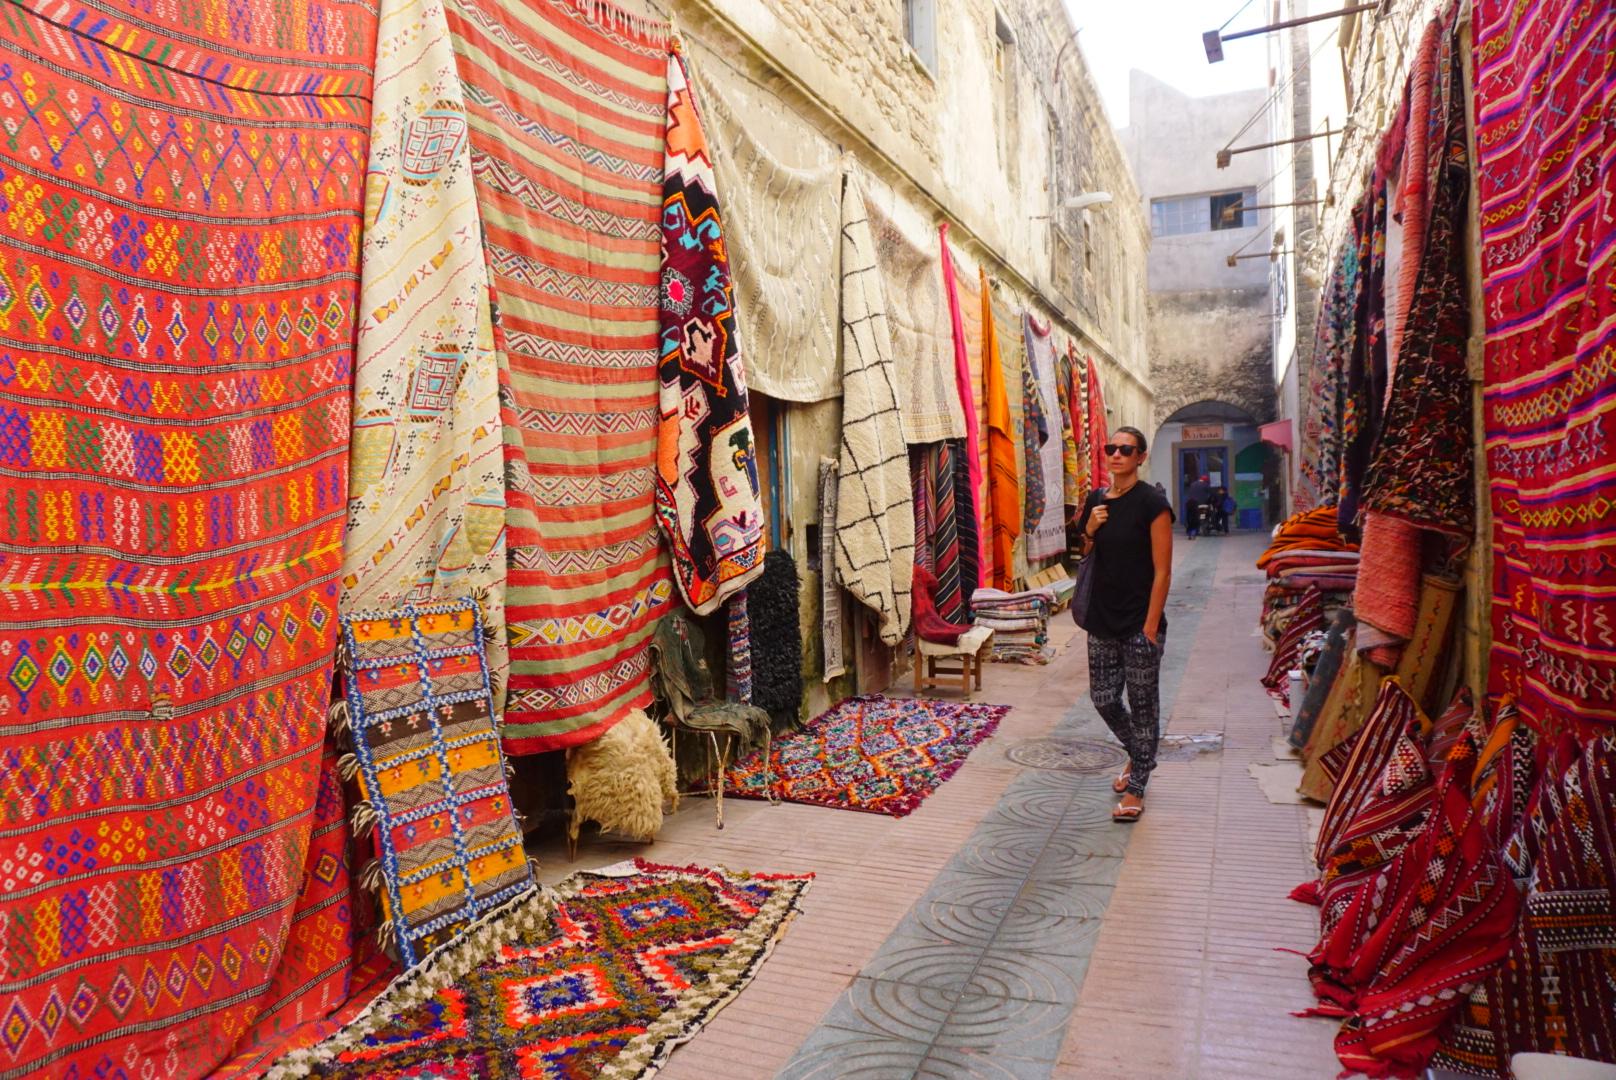 svět je cool - maroko rozpočet